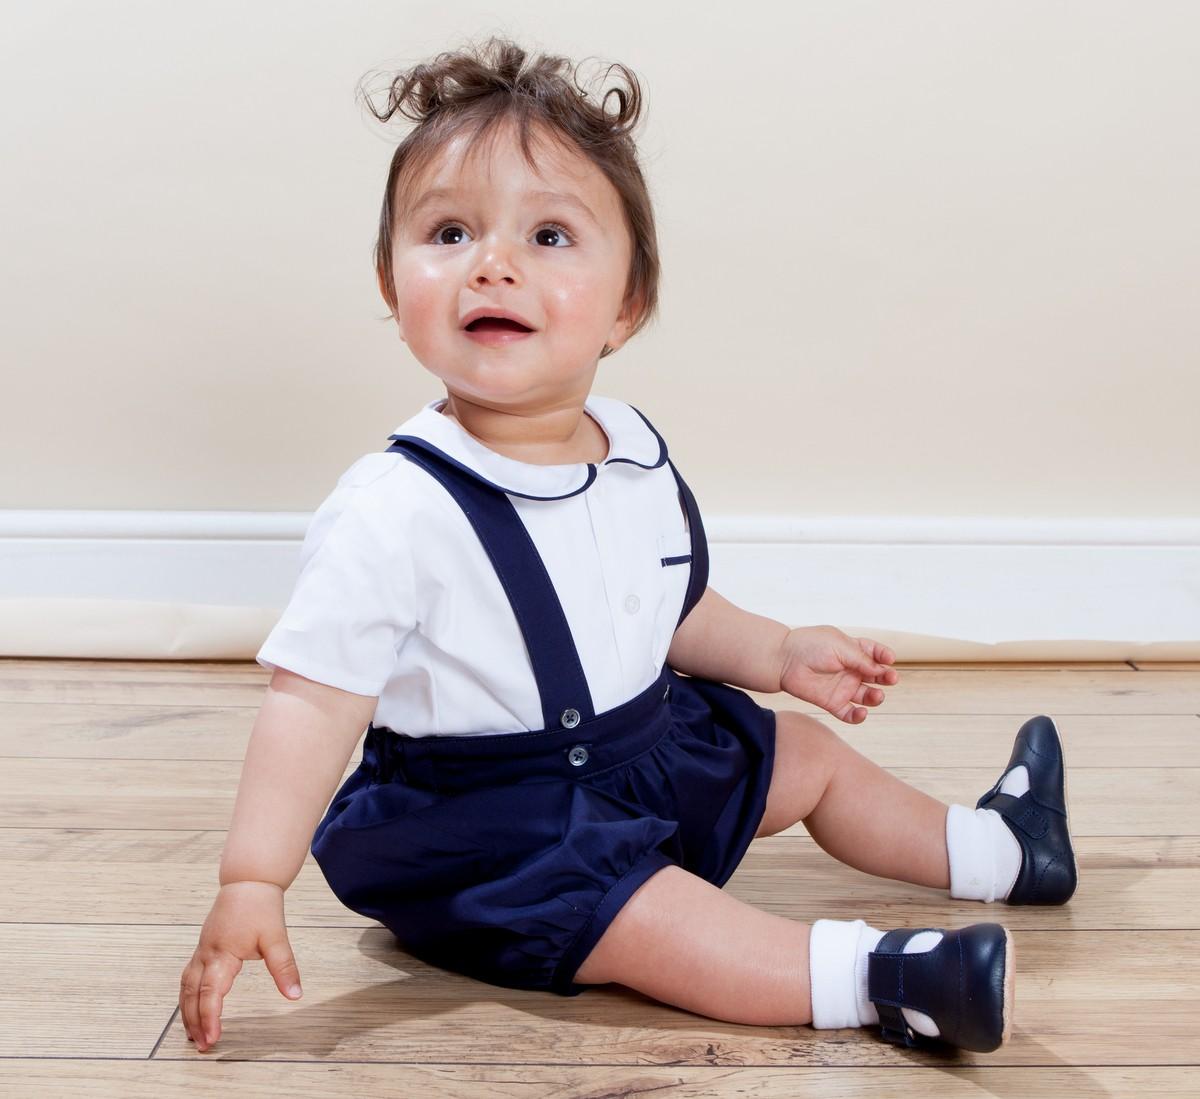 img_22261?w=471&h=432 suehillclothing classic childrenswear 0 10 years, handmade in the uk,Childrens Clothes Tunbridge Wells